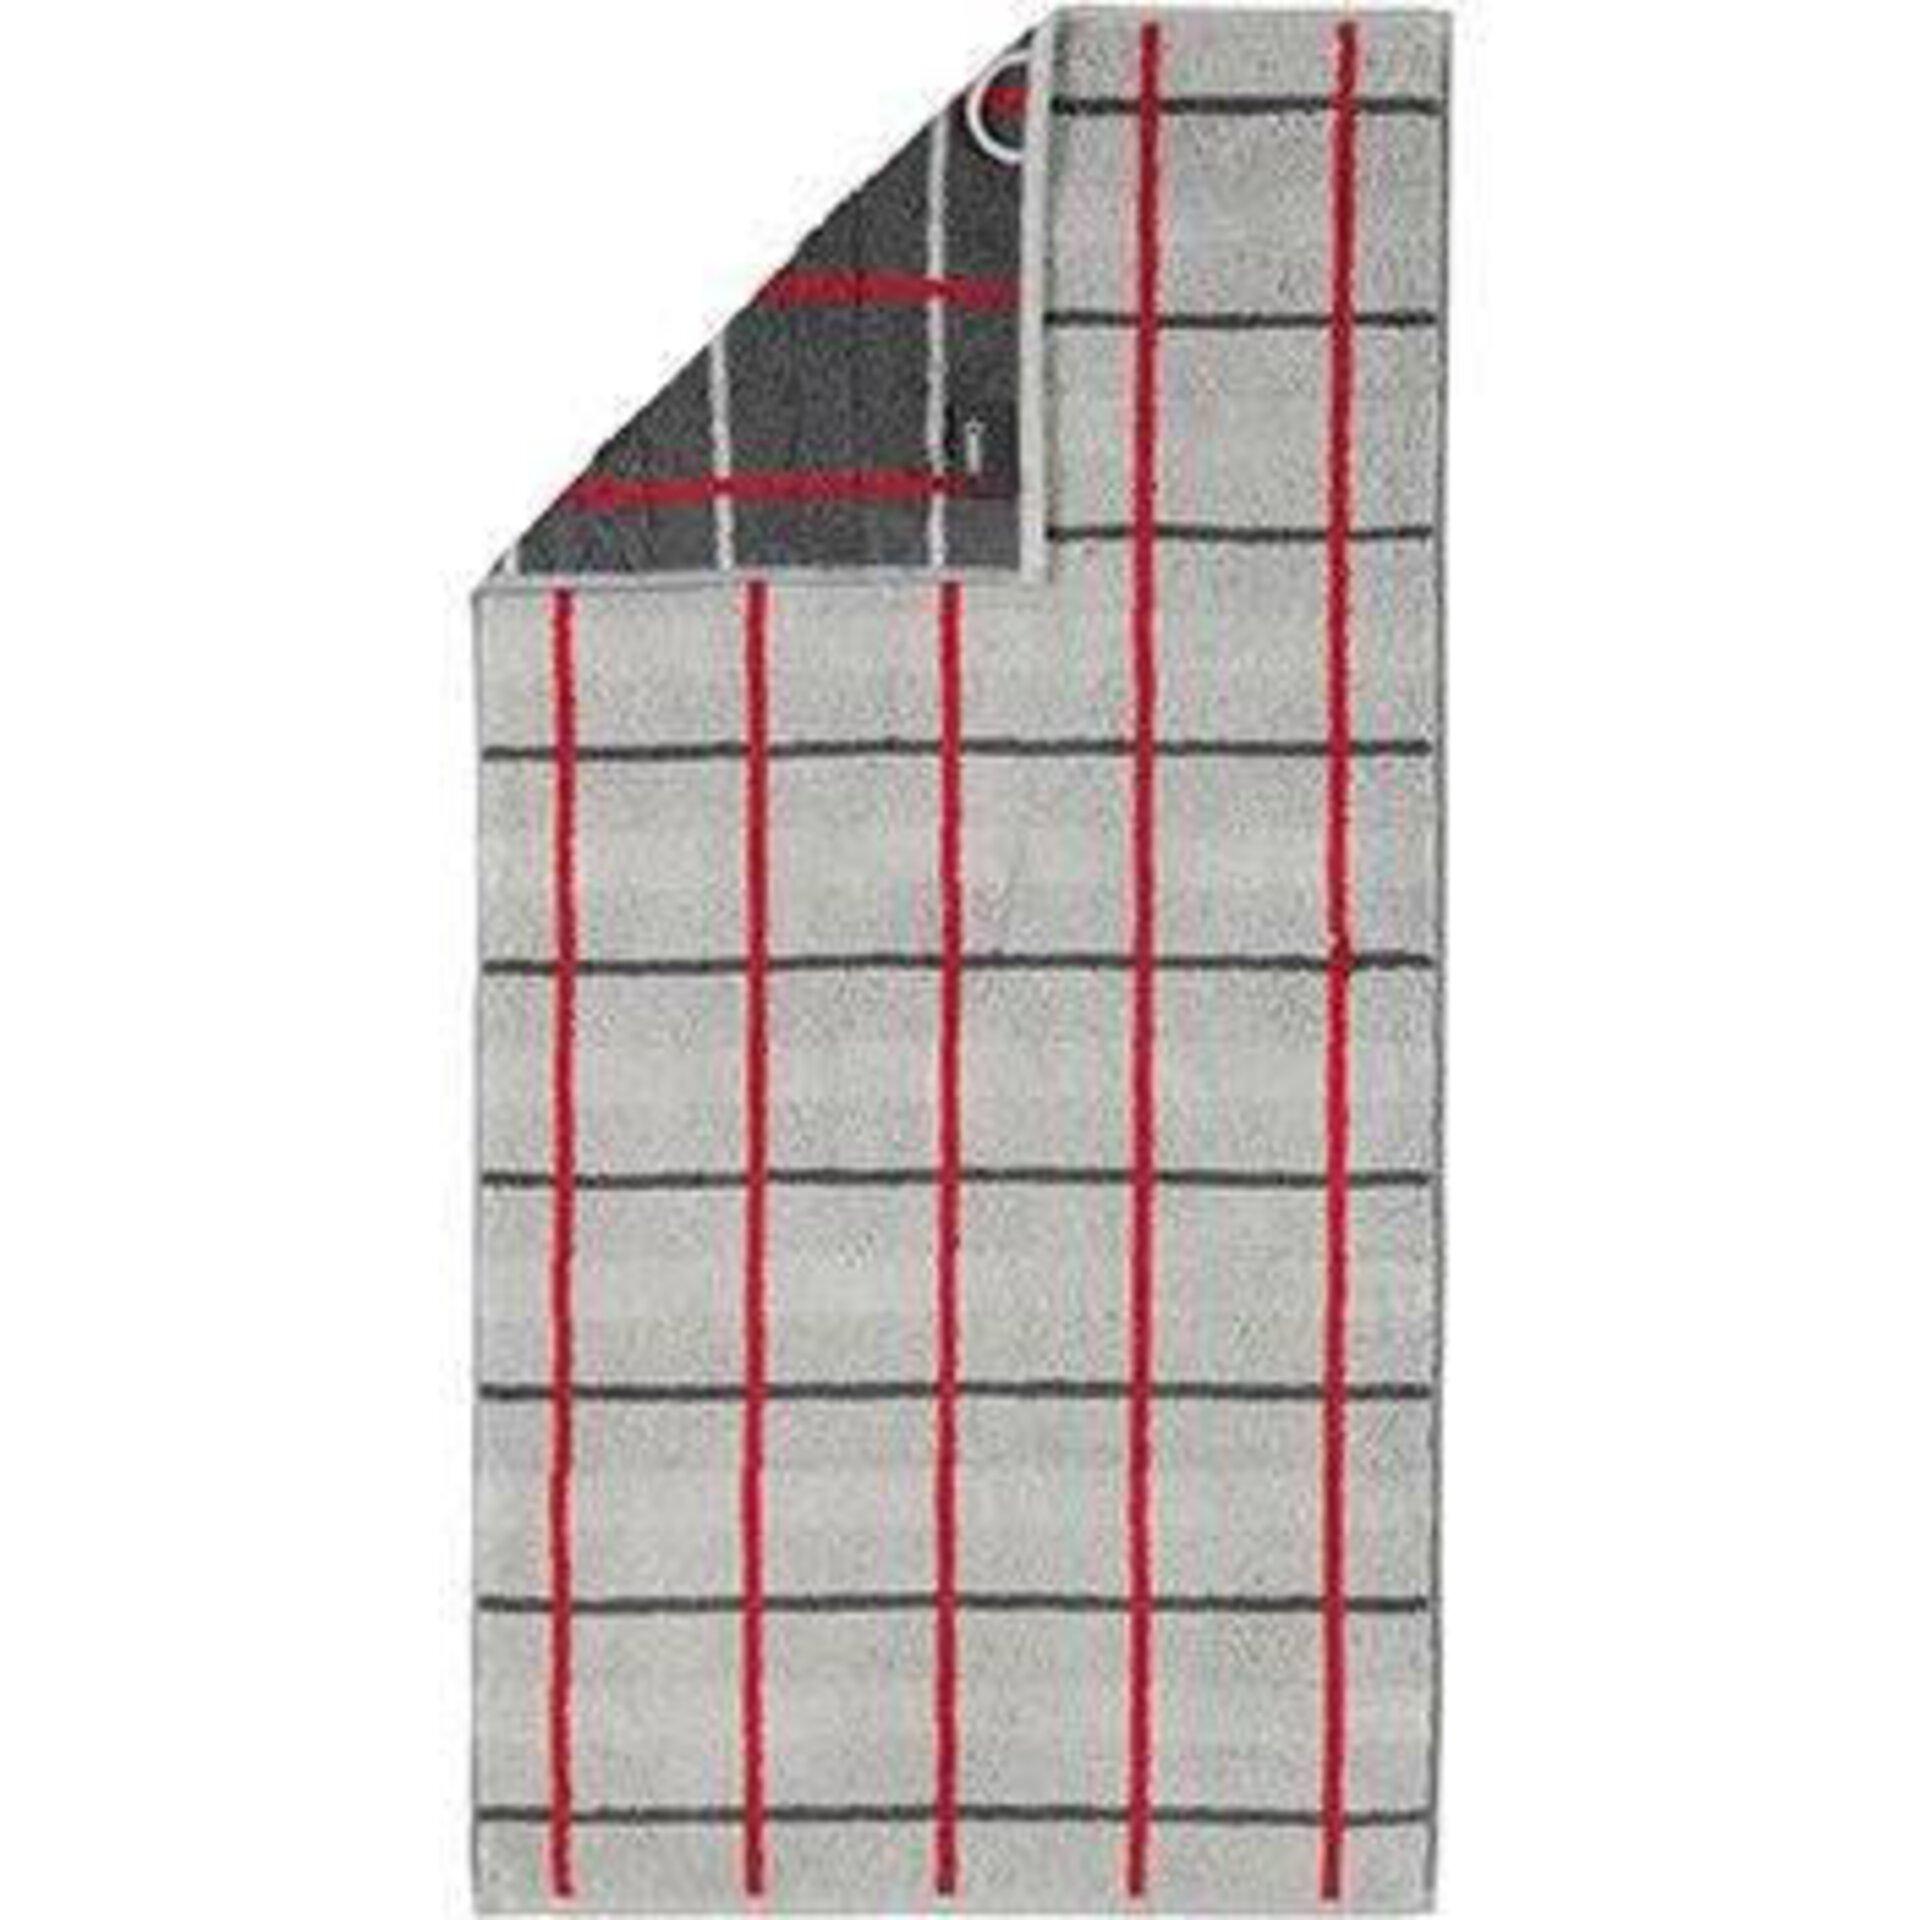 Duschtuch Cawö Textil grau 50 x 100 cm